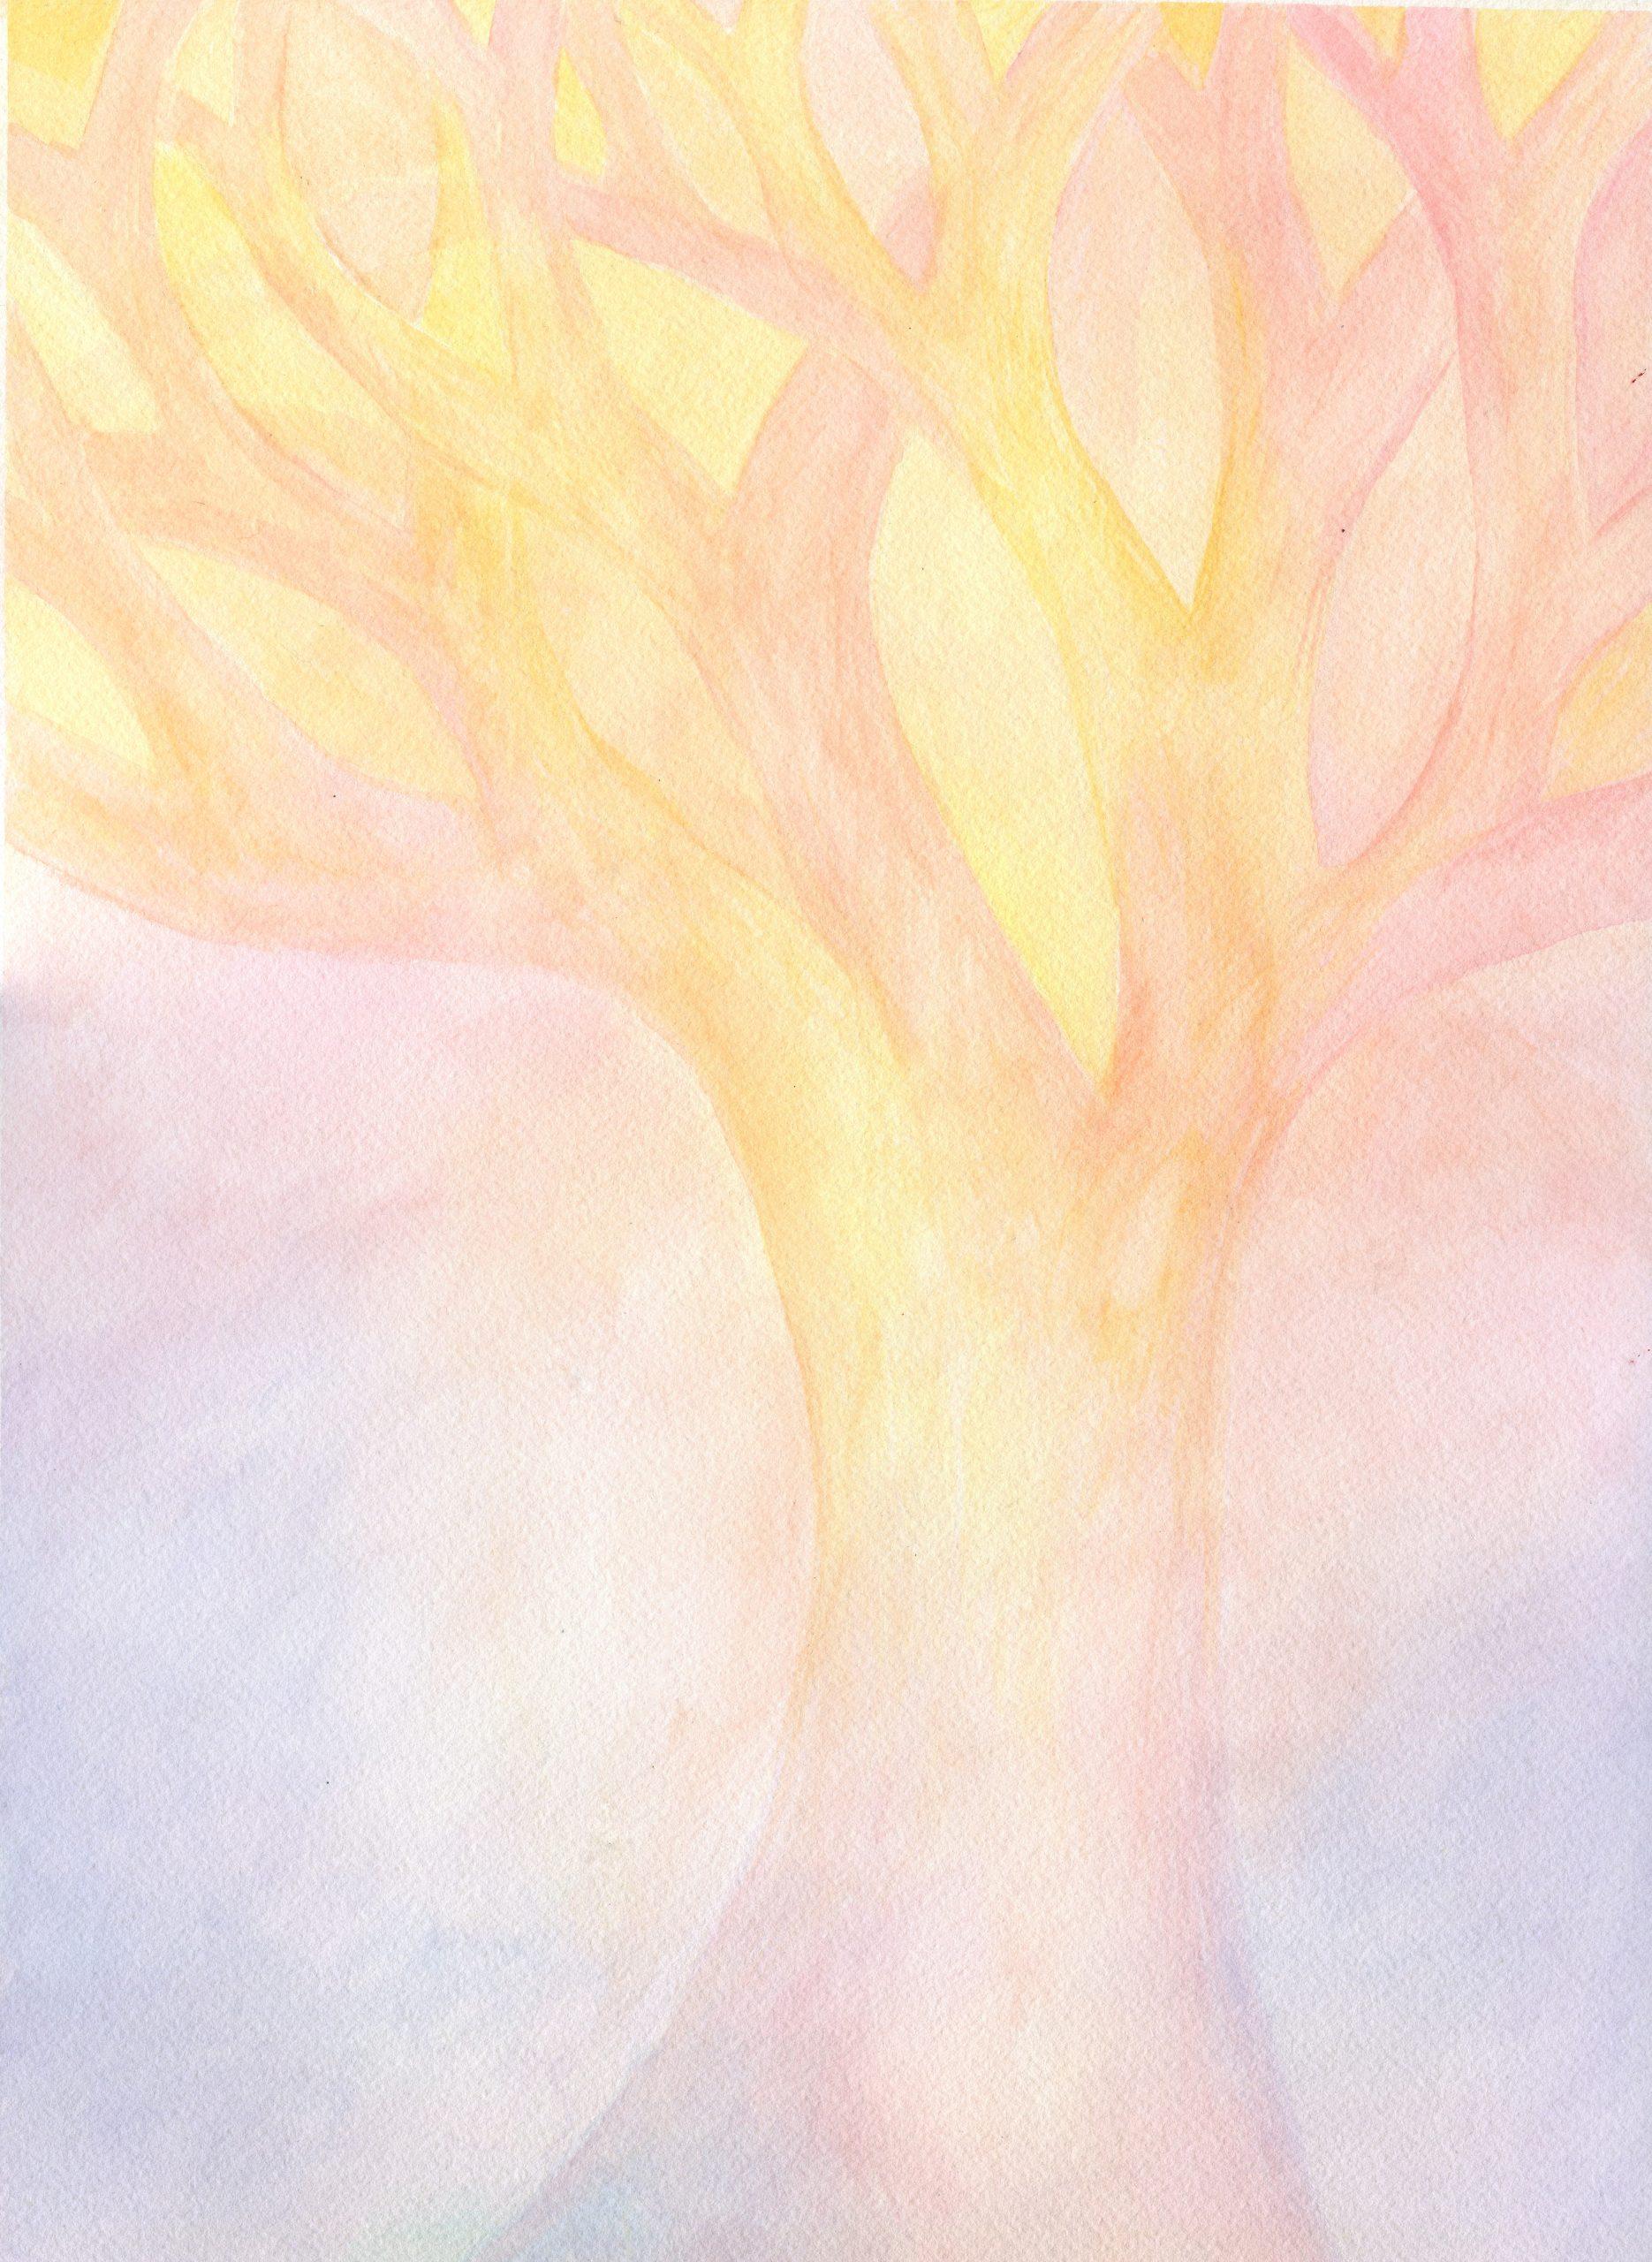 Pastel Tree - Veil Watercolor - 11 X 15 - $225